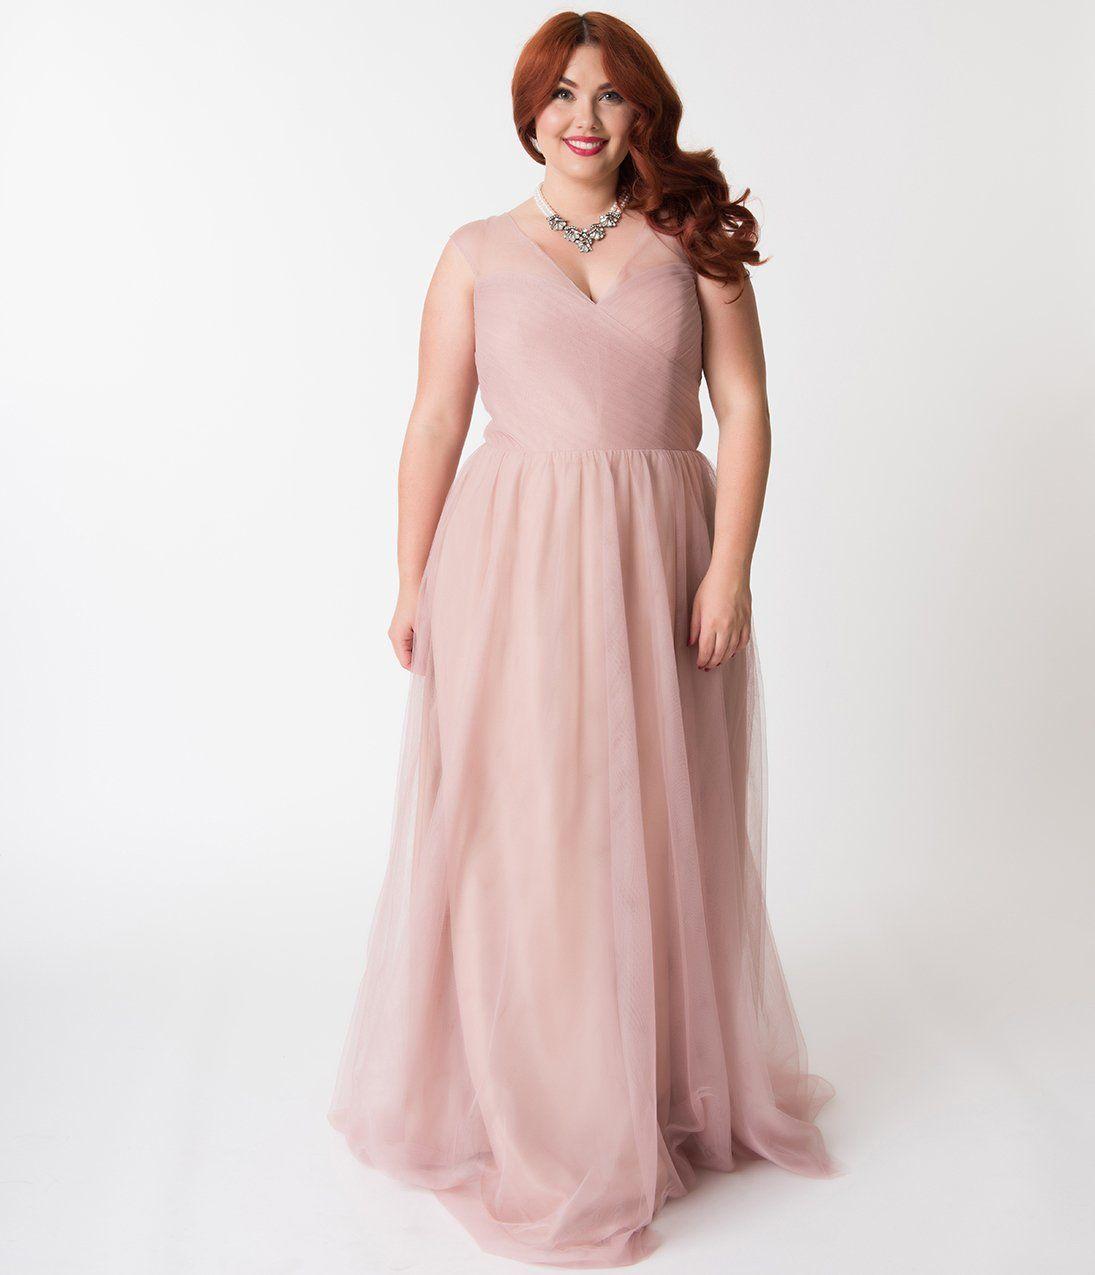 plus size blush dresses for wedding